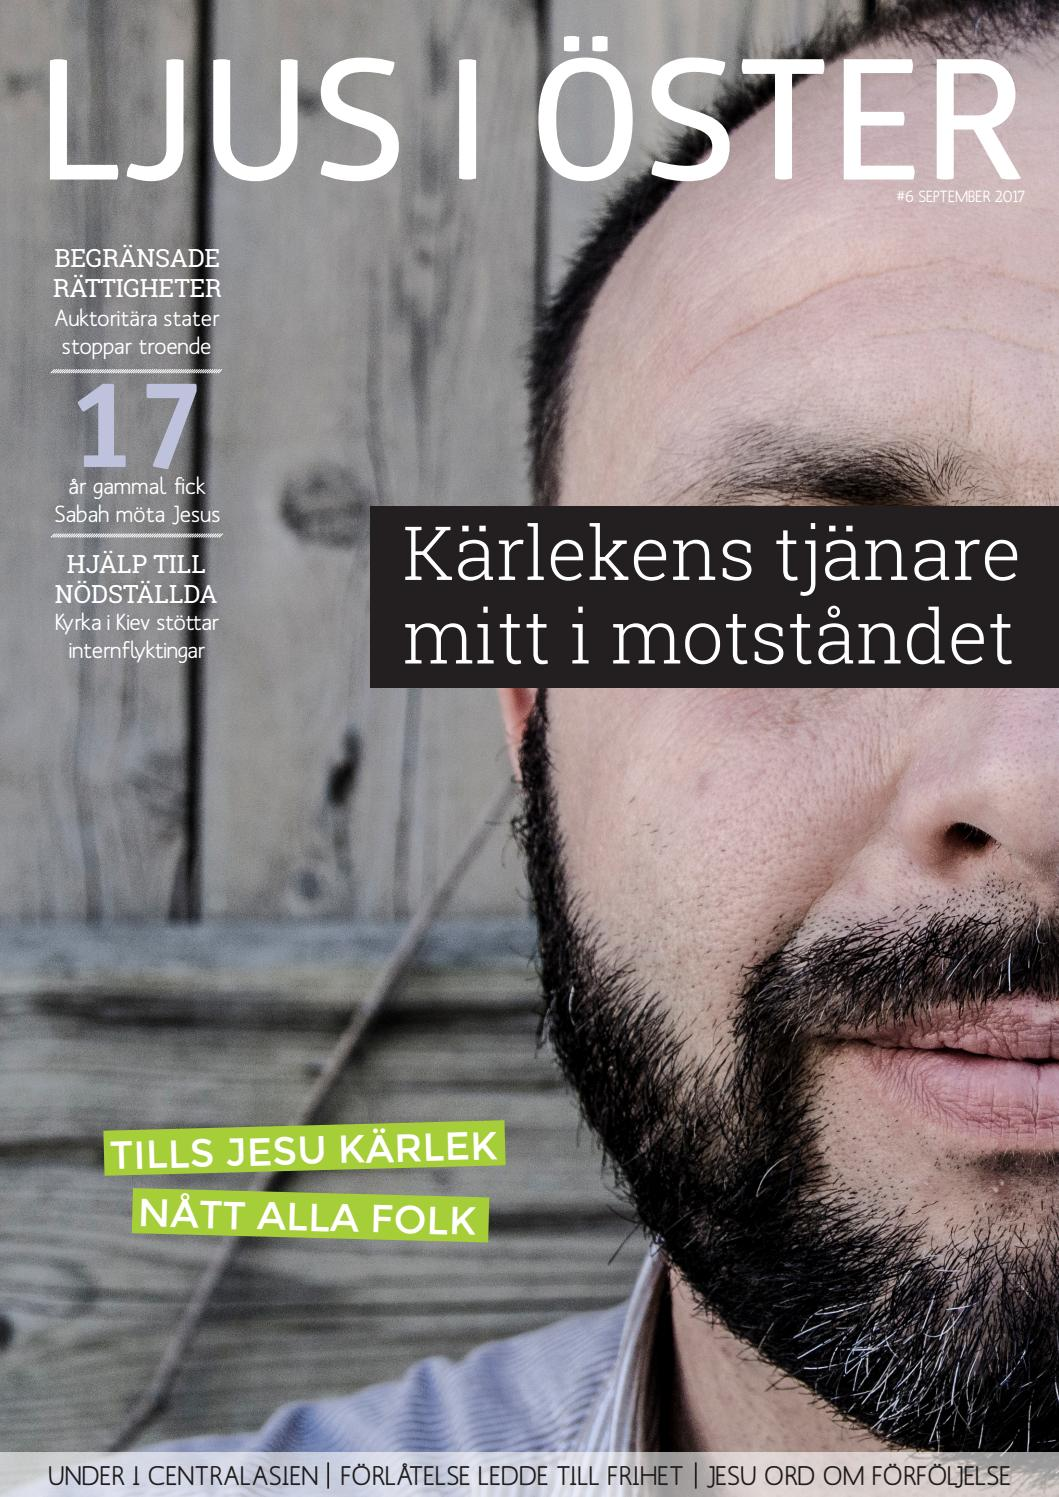 Kyrkeby Furudalen 121 Vstra Gtalands ln, Lysekil - unam.net